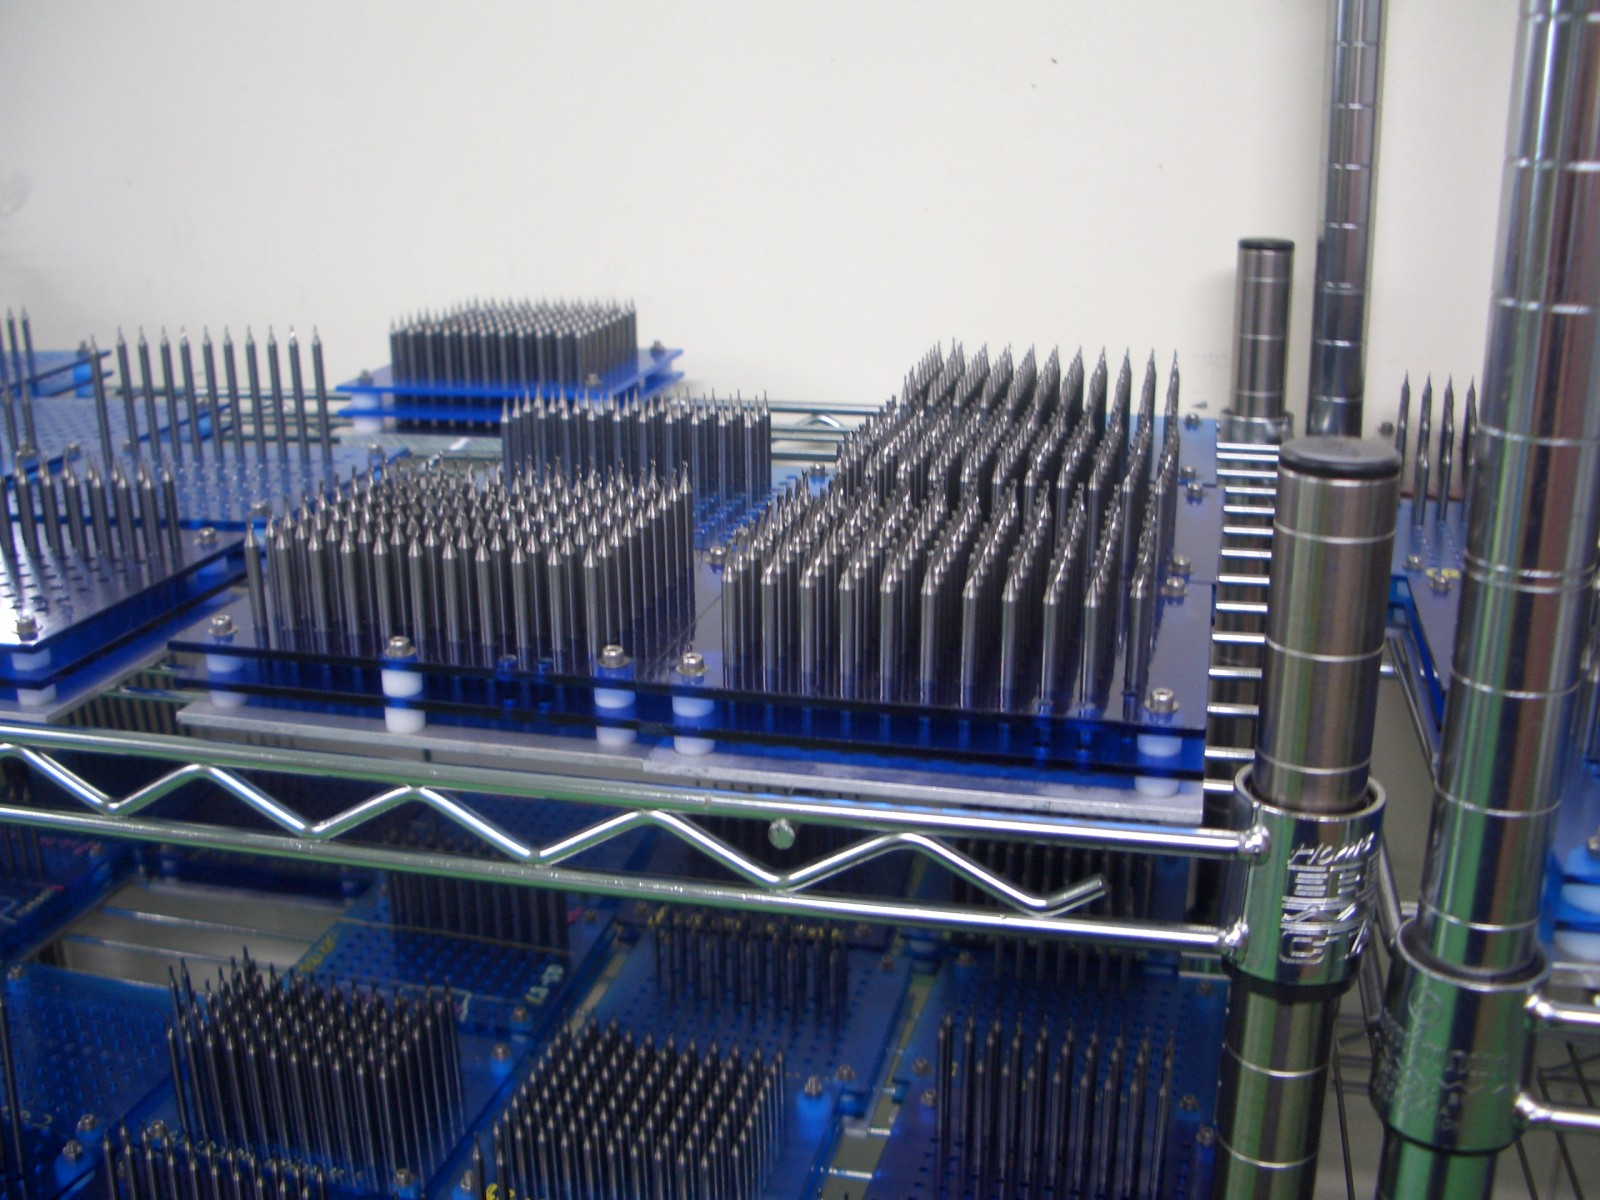 量産工具の一例